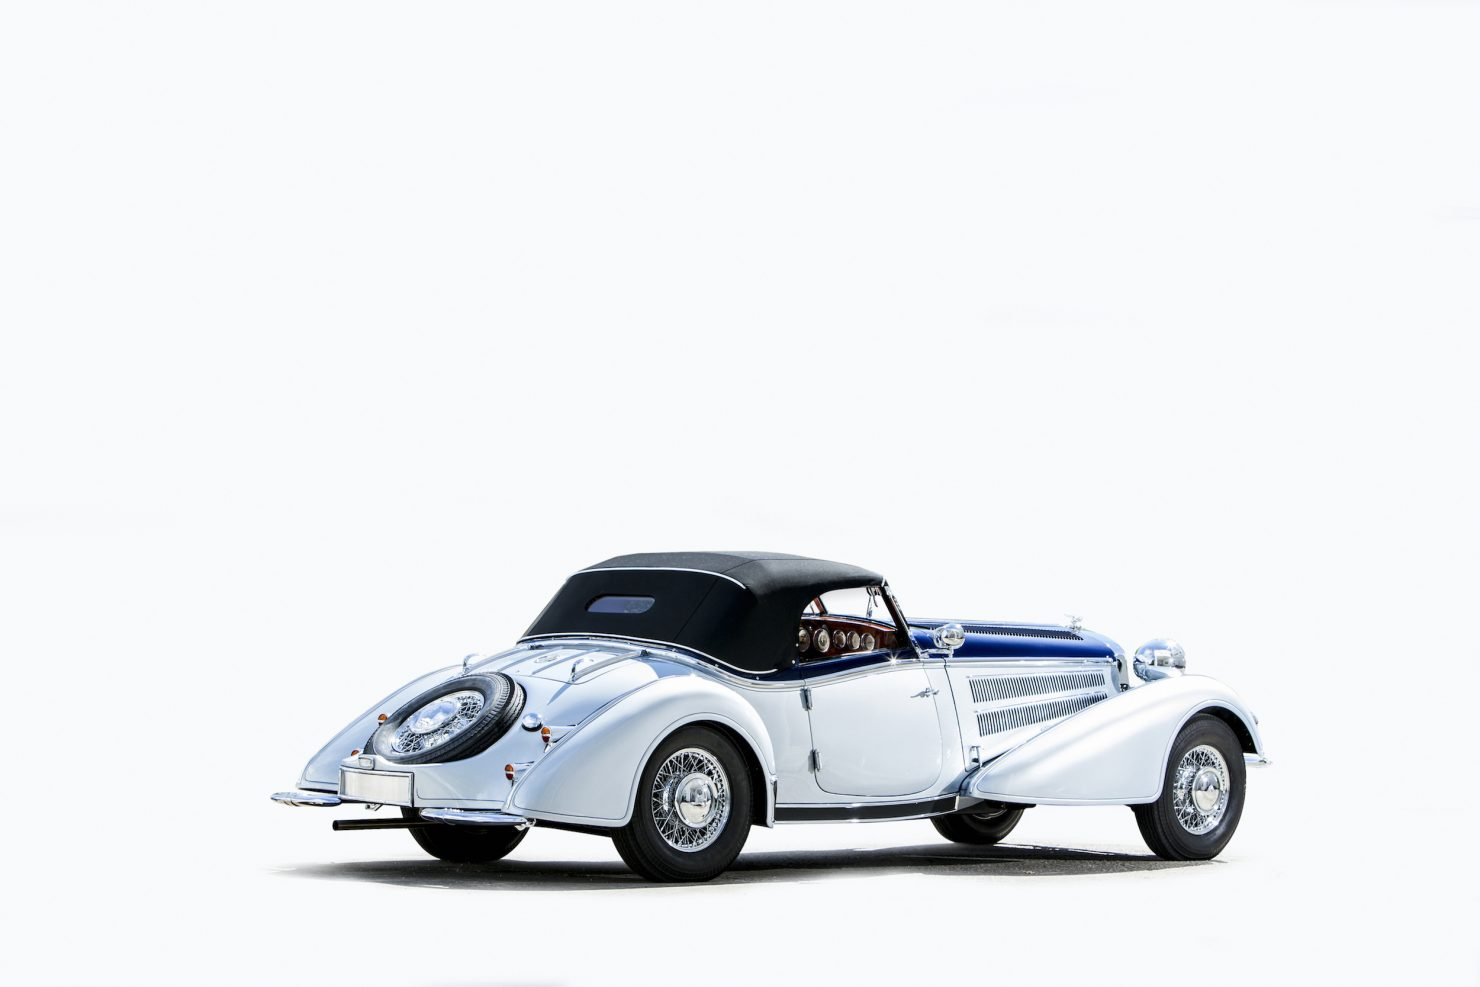 Horch 853 Spezialroadster 4 1480x987 - 1936 Horch 853 Spezialroadster